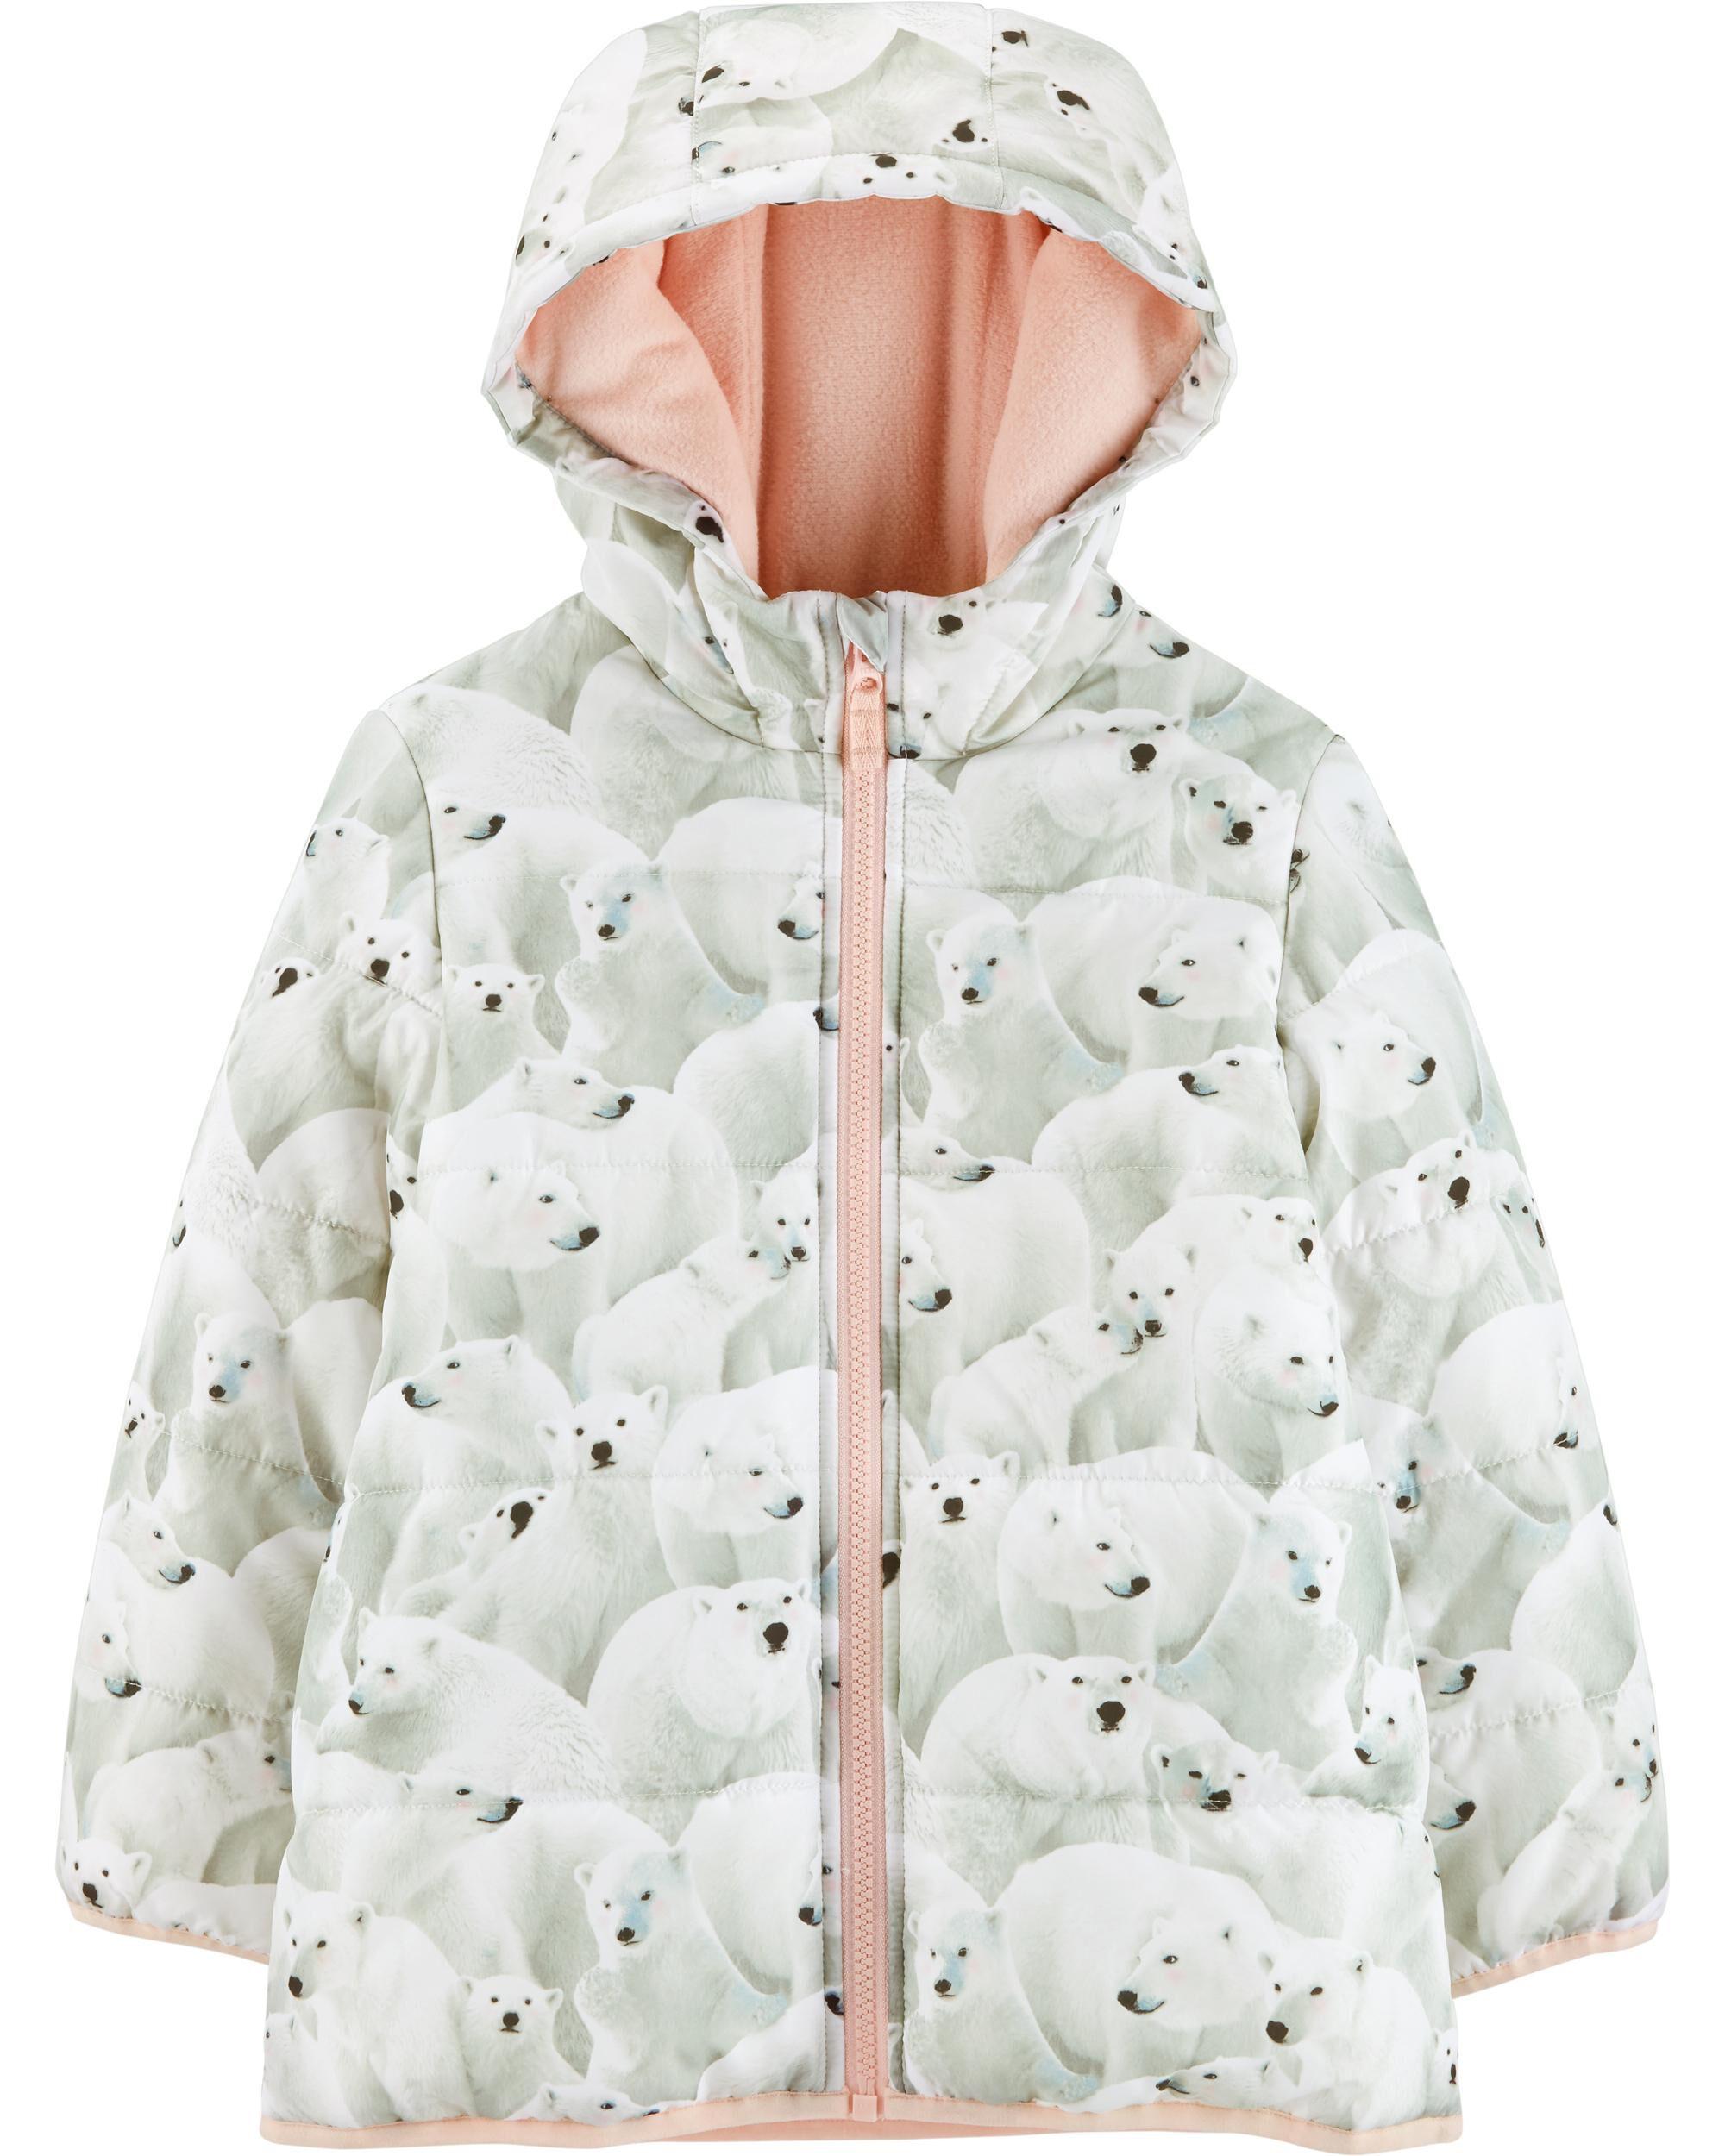 *CLEARANCE* Polar Bear Puffer Jacket